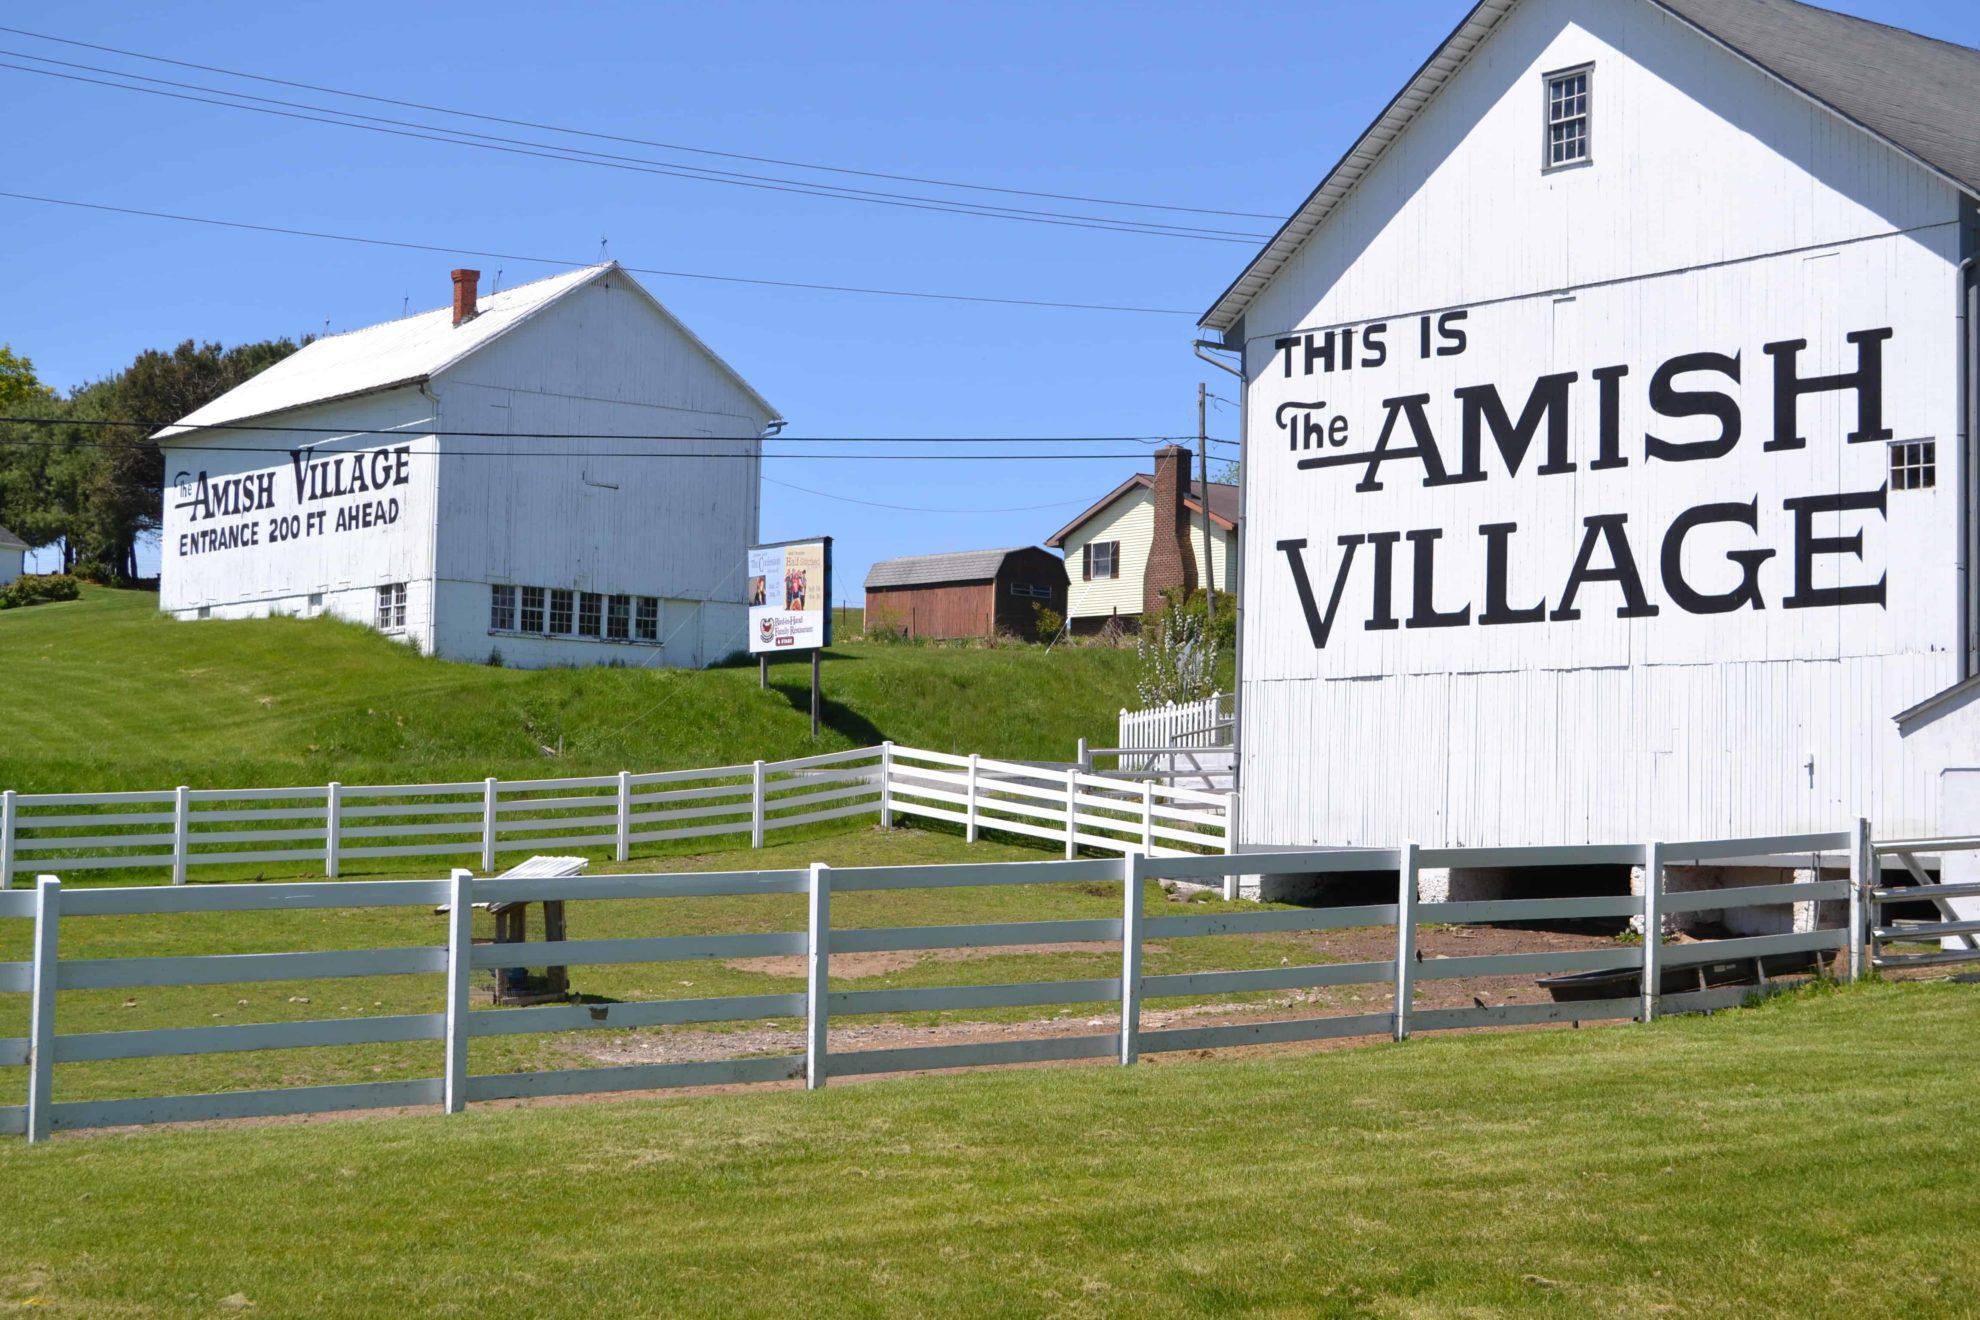 Amish Village, Ronks PA, #VisitLancaster